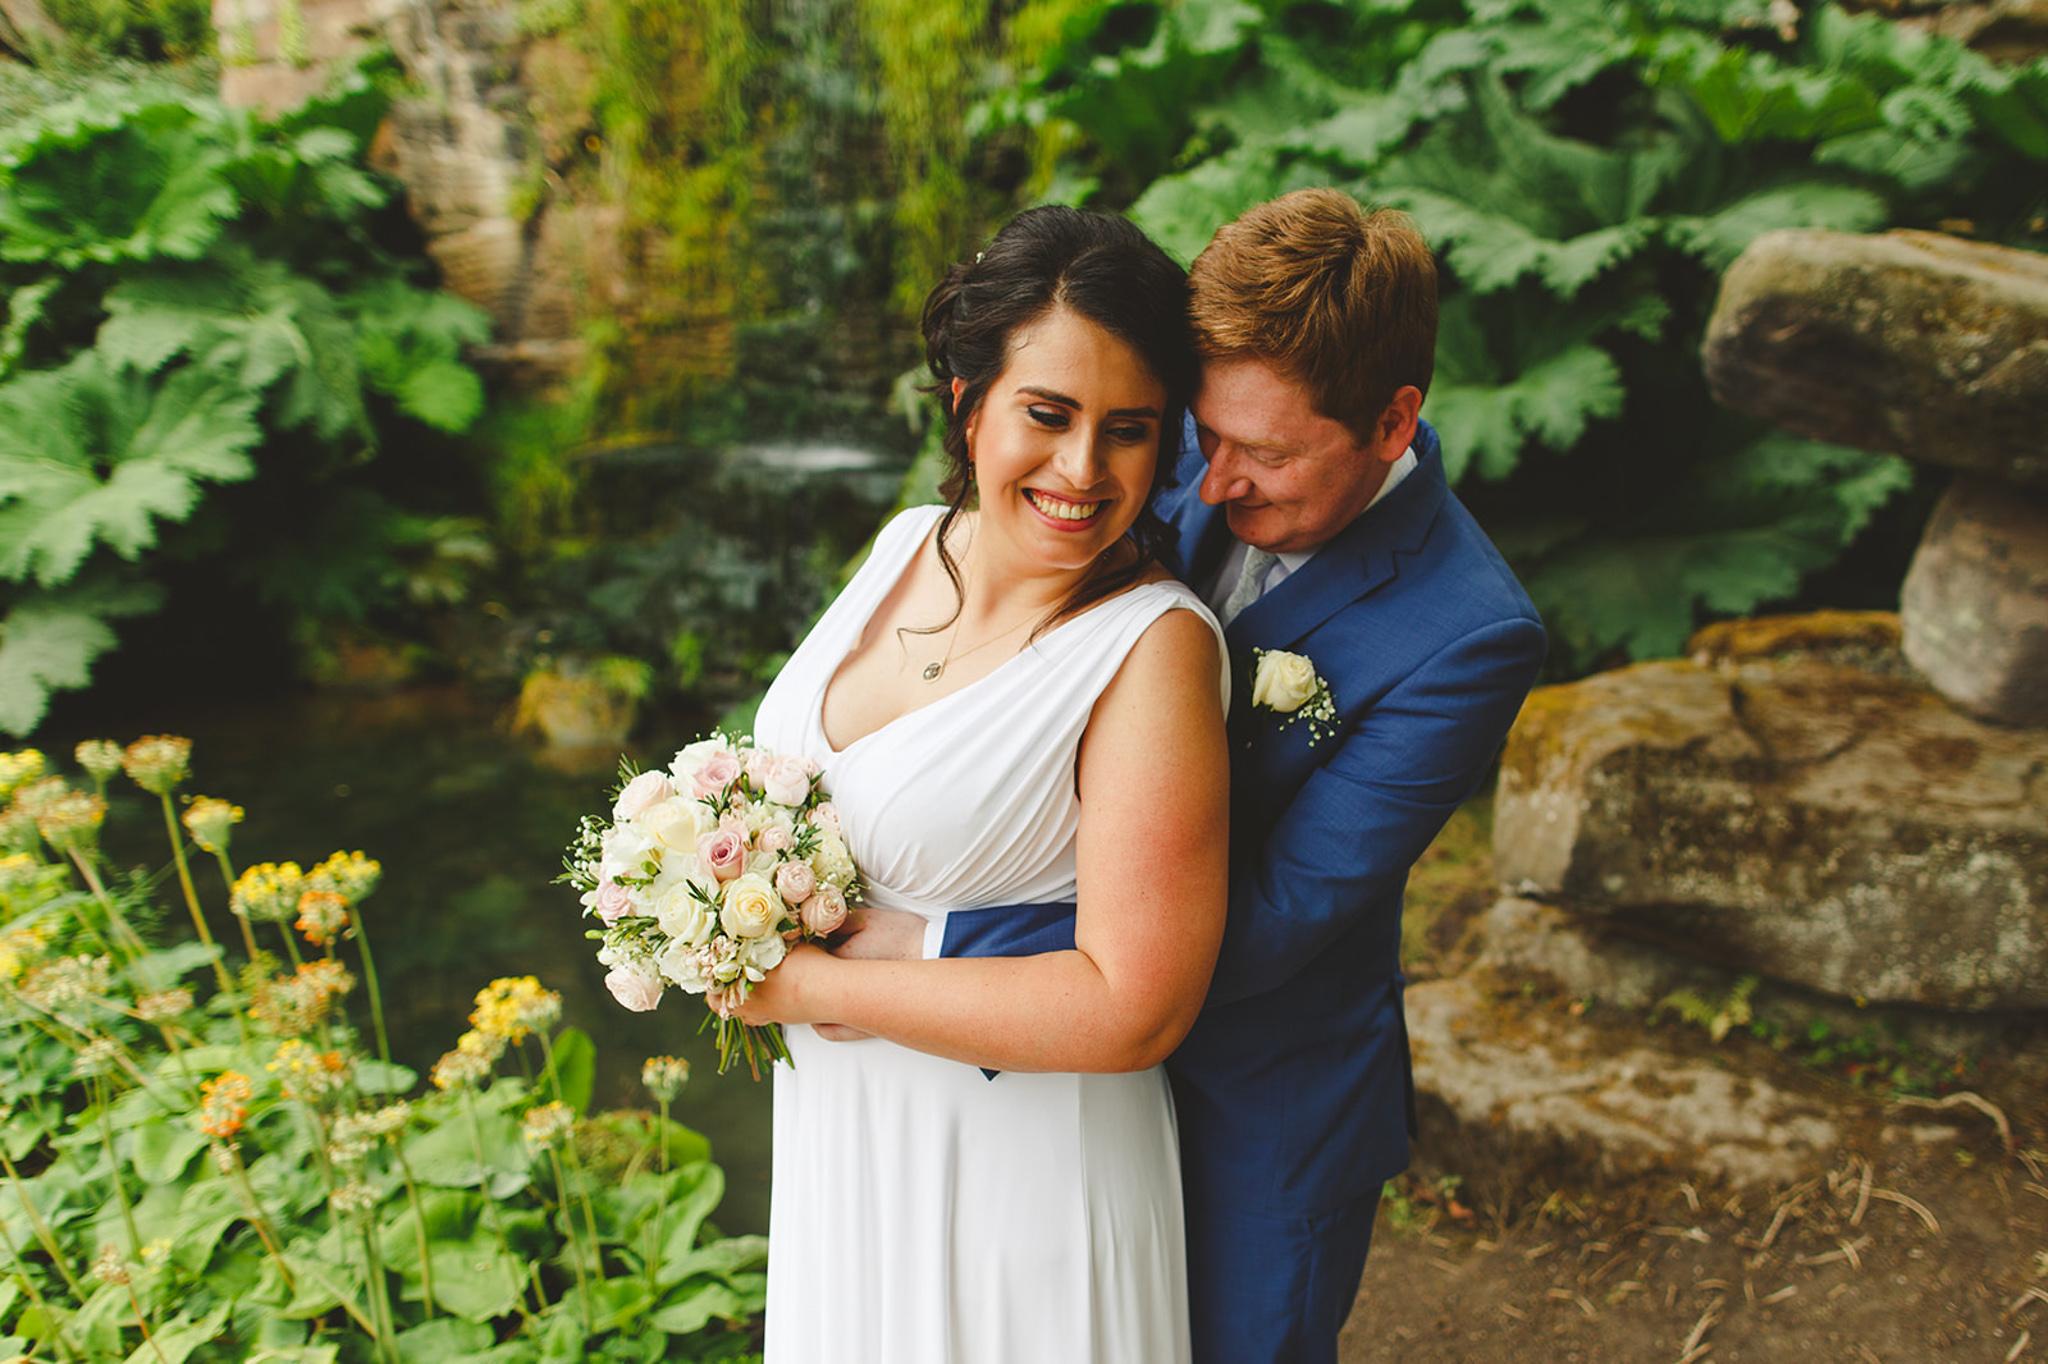 derby-wedding-photographer-camera-hannah-blog-17.jpg